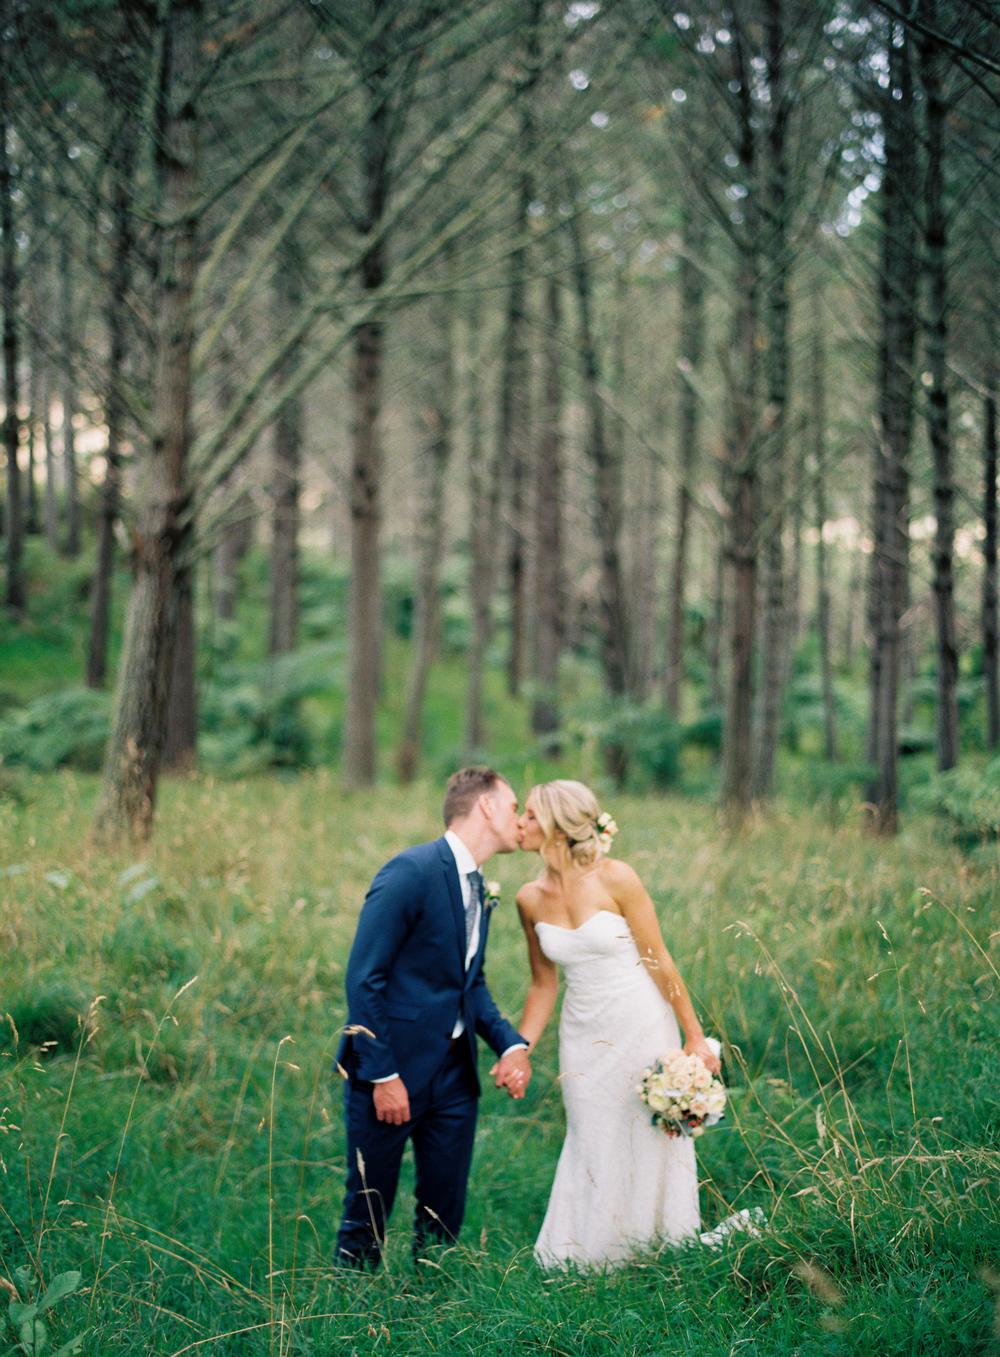 new-zealand-wedding-film-photographer-ryan-flynn-0023.JPG